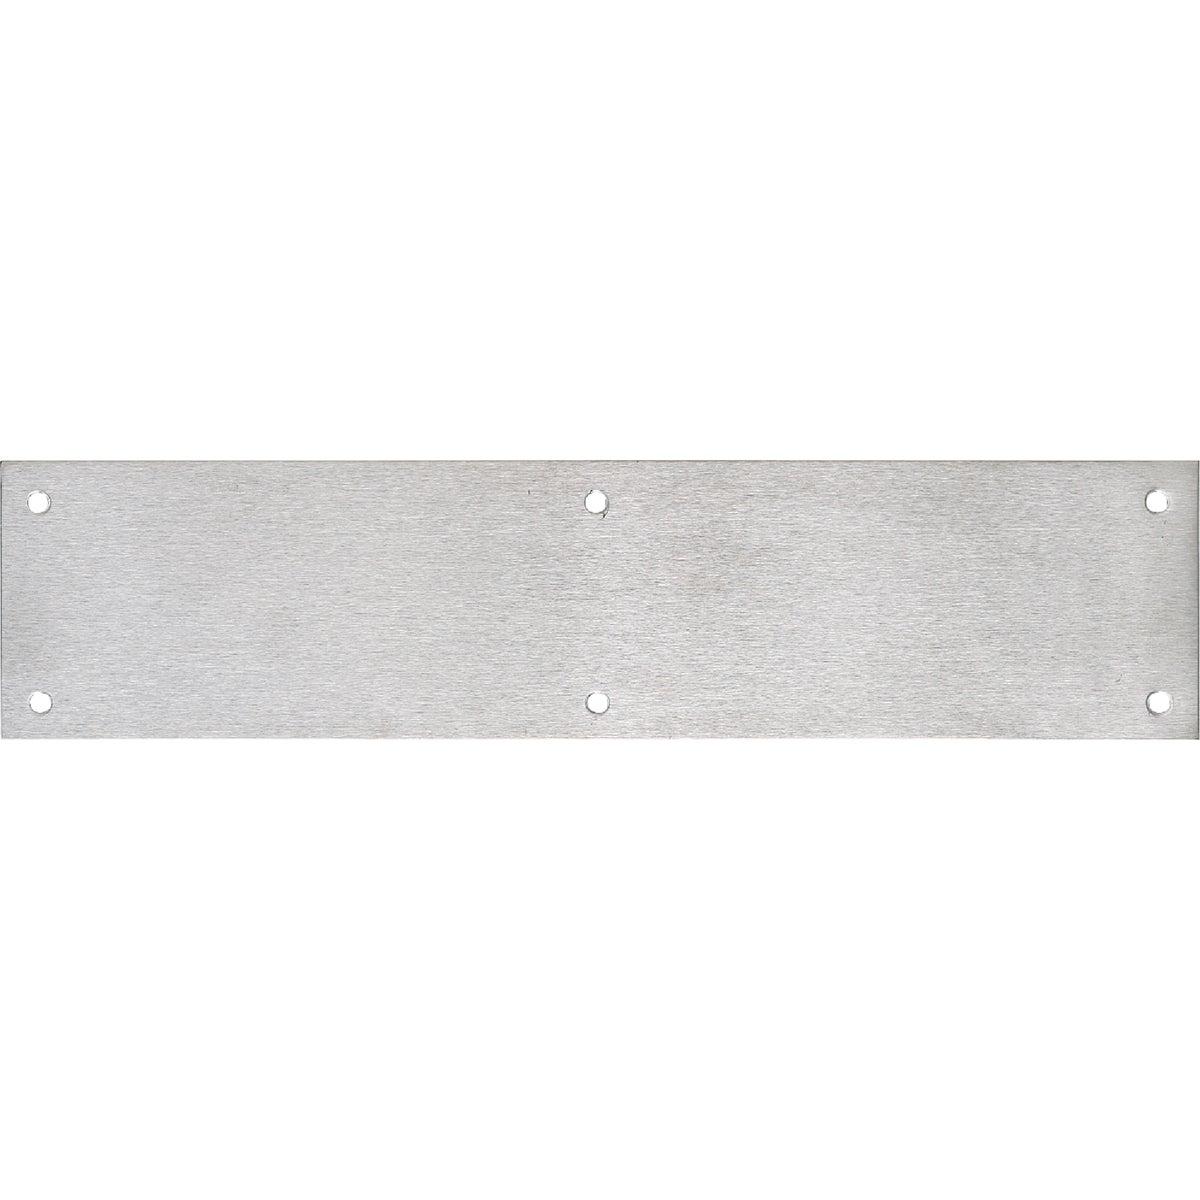 3.5X15 32D Push Plate